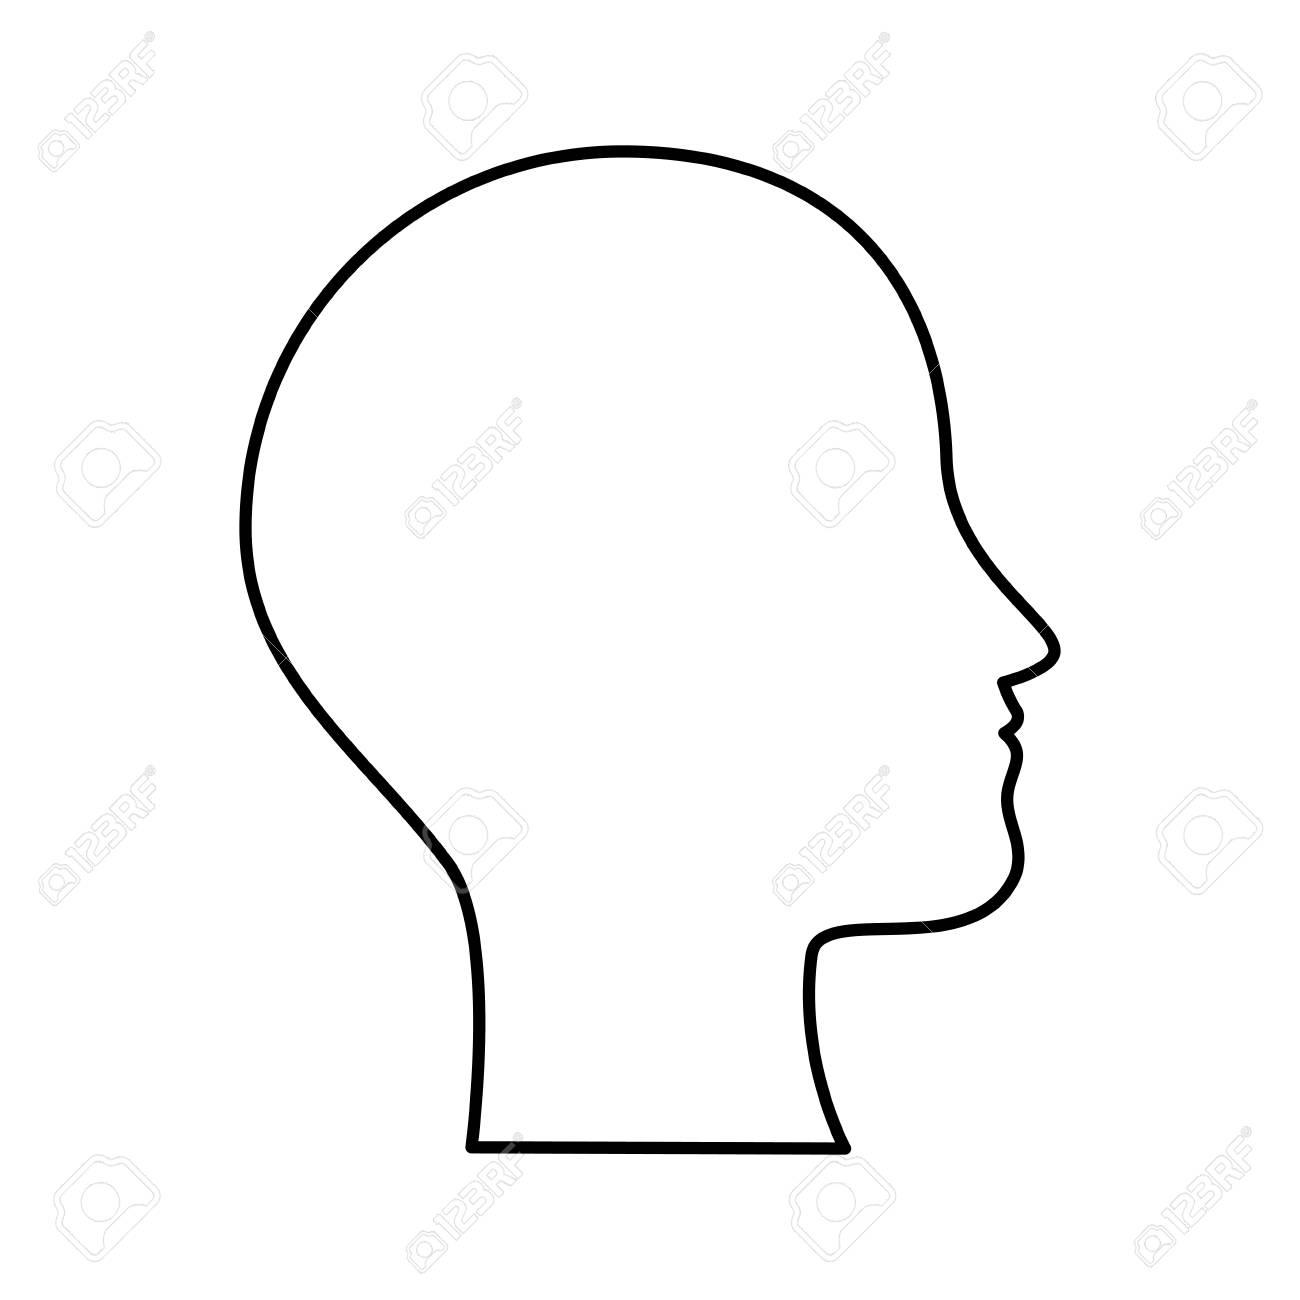 human profile isolated icon vector illustration design - 90406682